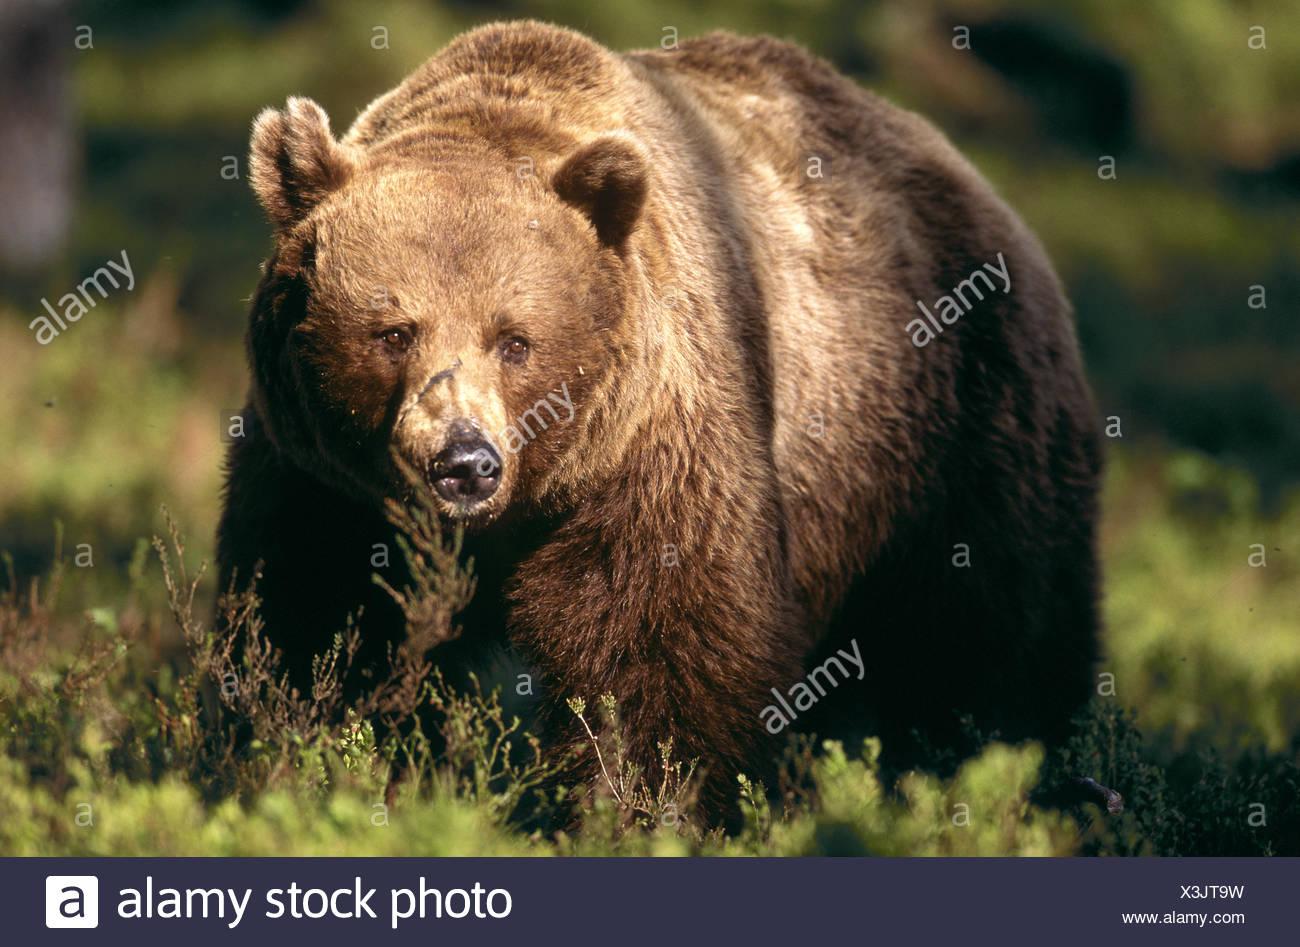 braunbaer ursus arctos brown